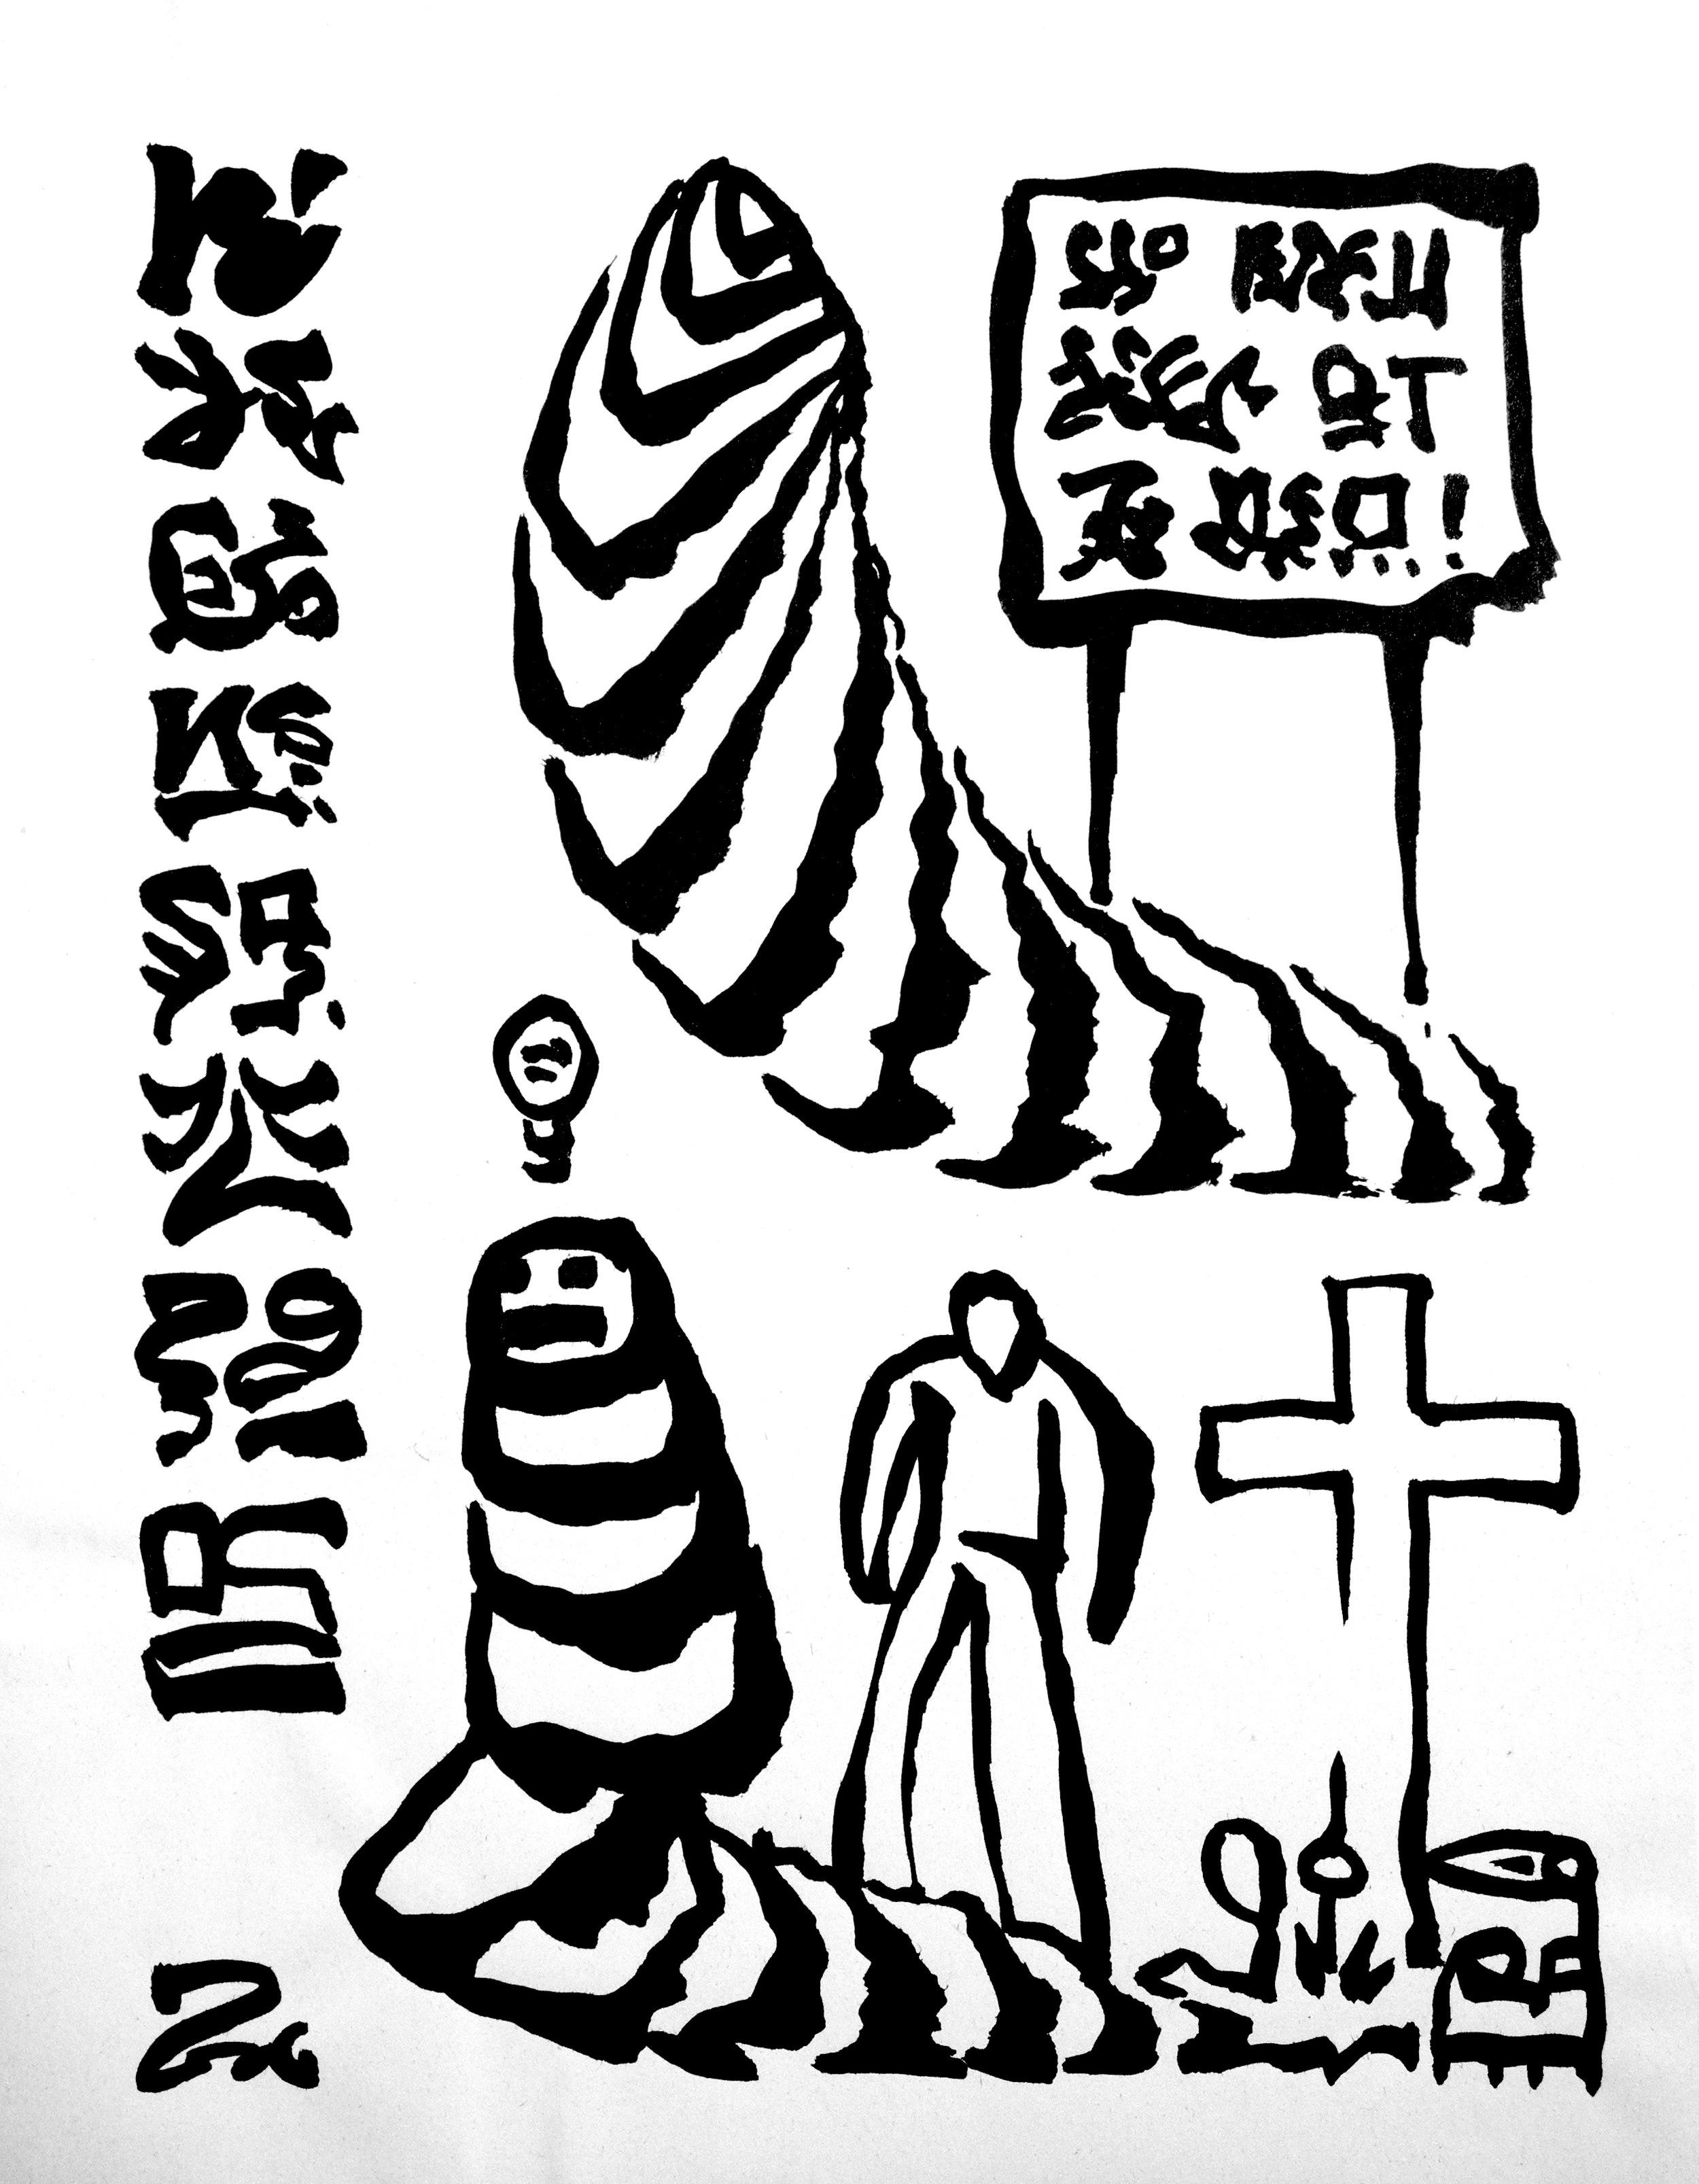 brush drawing 90s 37.JPG